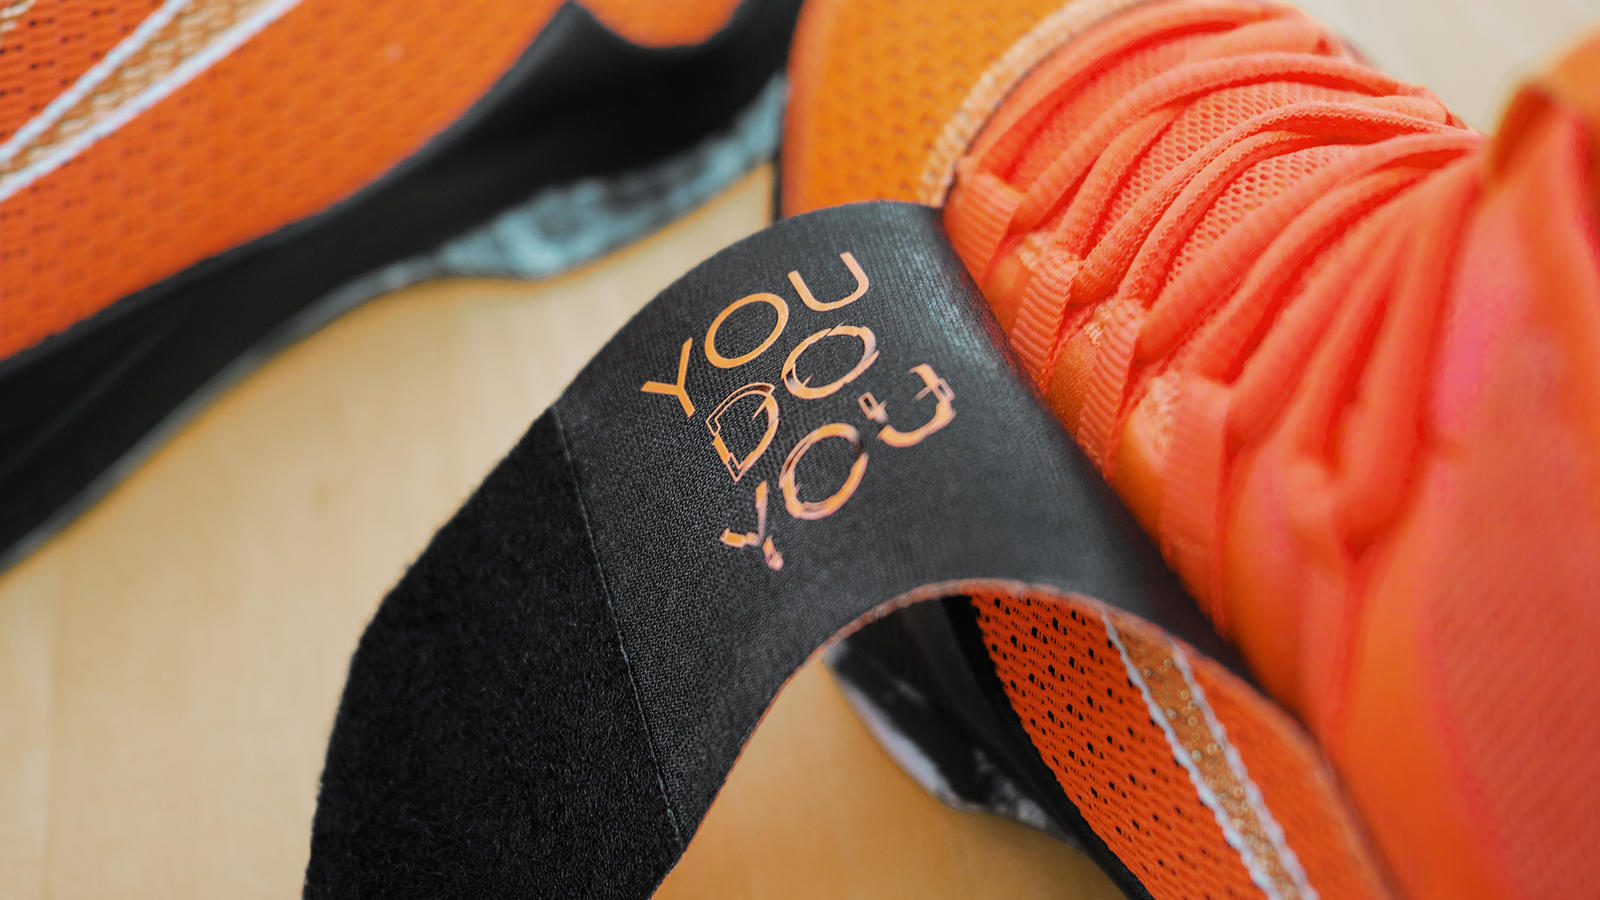 Nike Zoom HyperRev Skylar Diggins PE